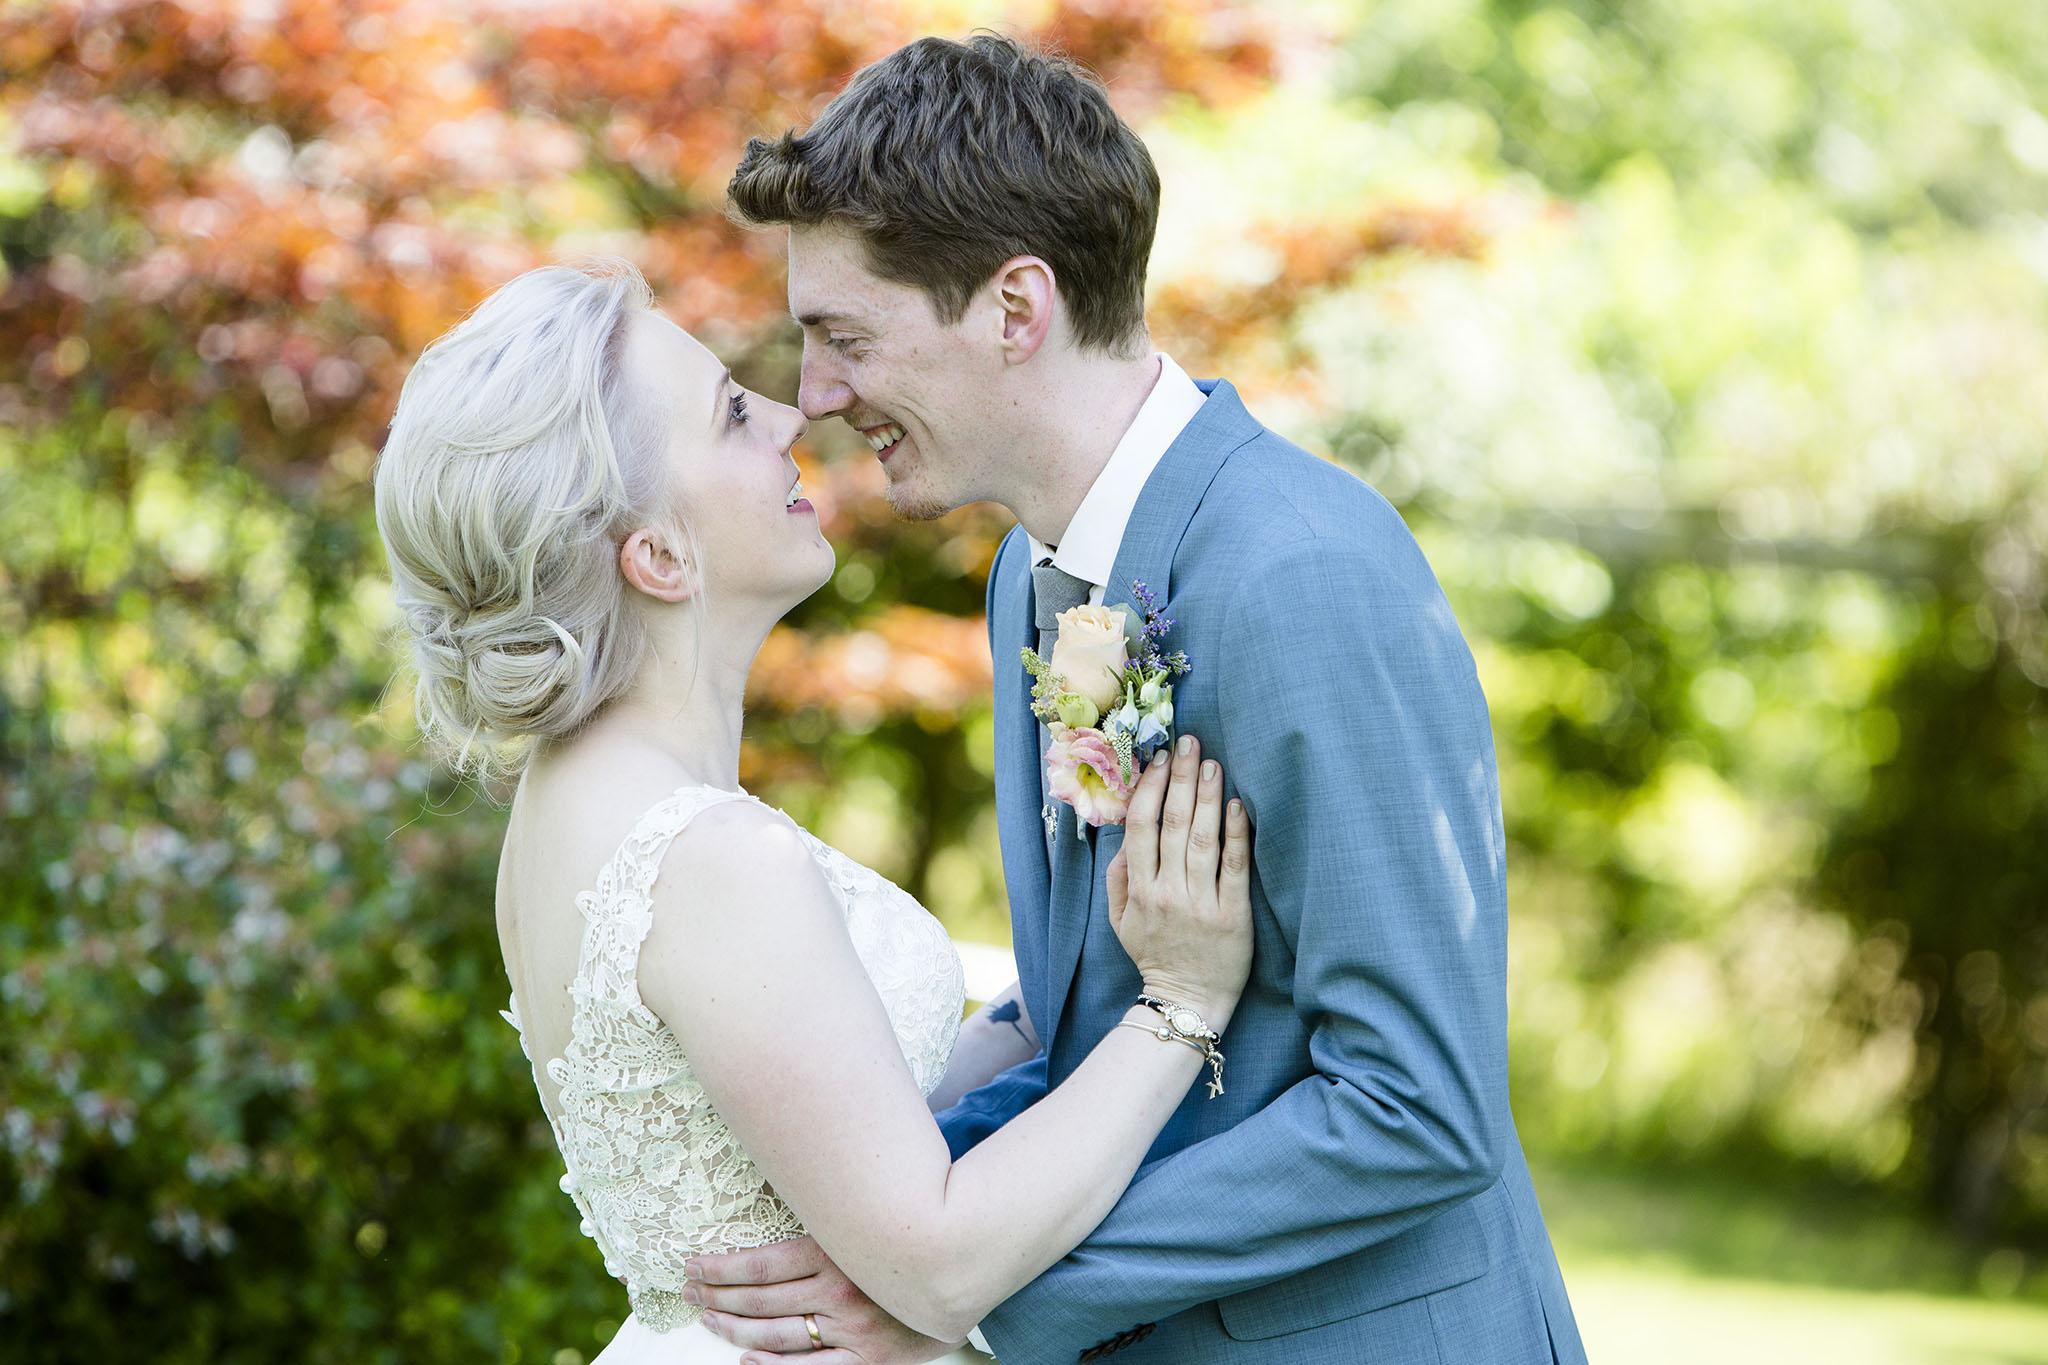 elizabethgphotography_kingslangley_hertfordshire_fineart_wedding_pottersbar_matt_katie_pegg_30.jpg